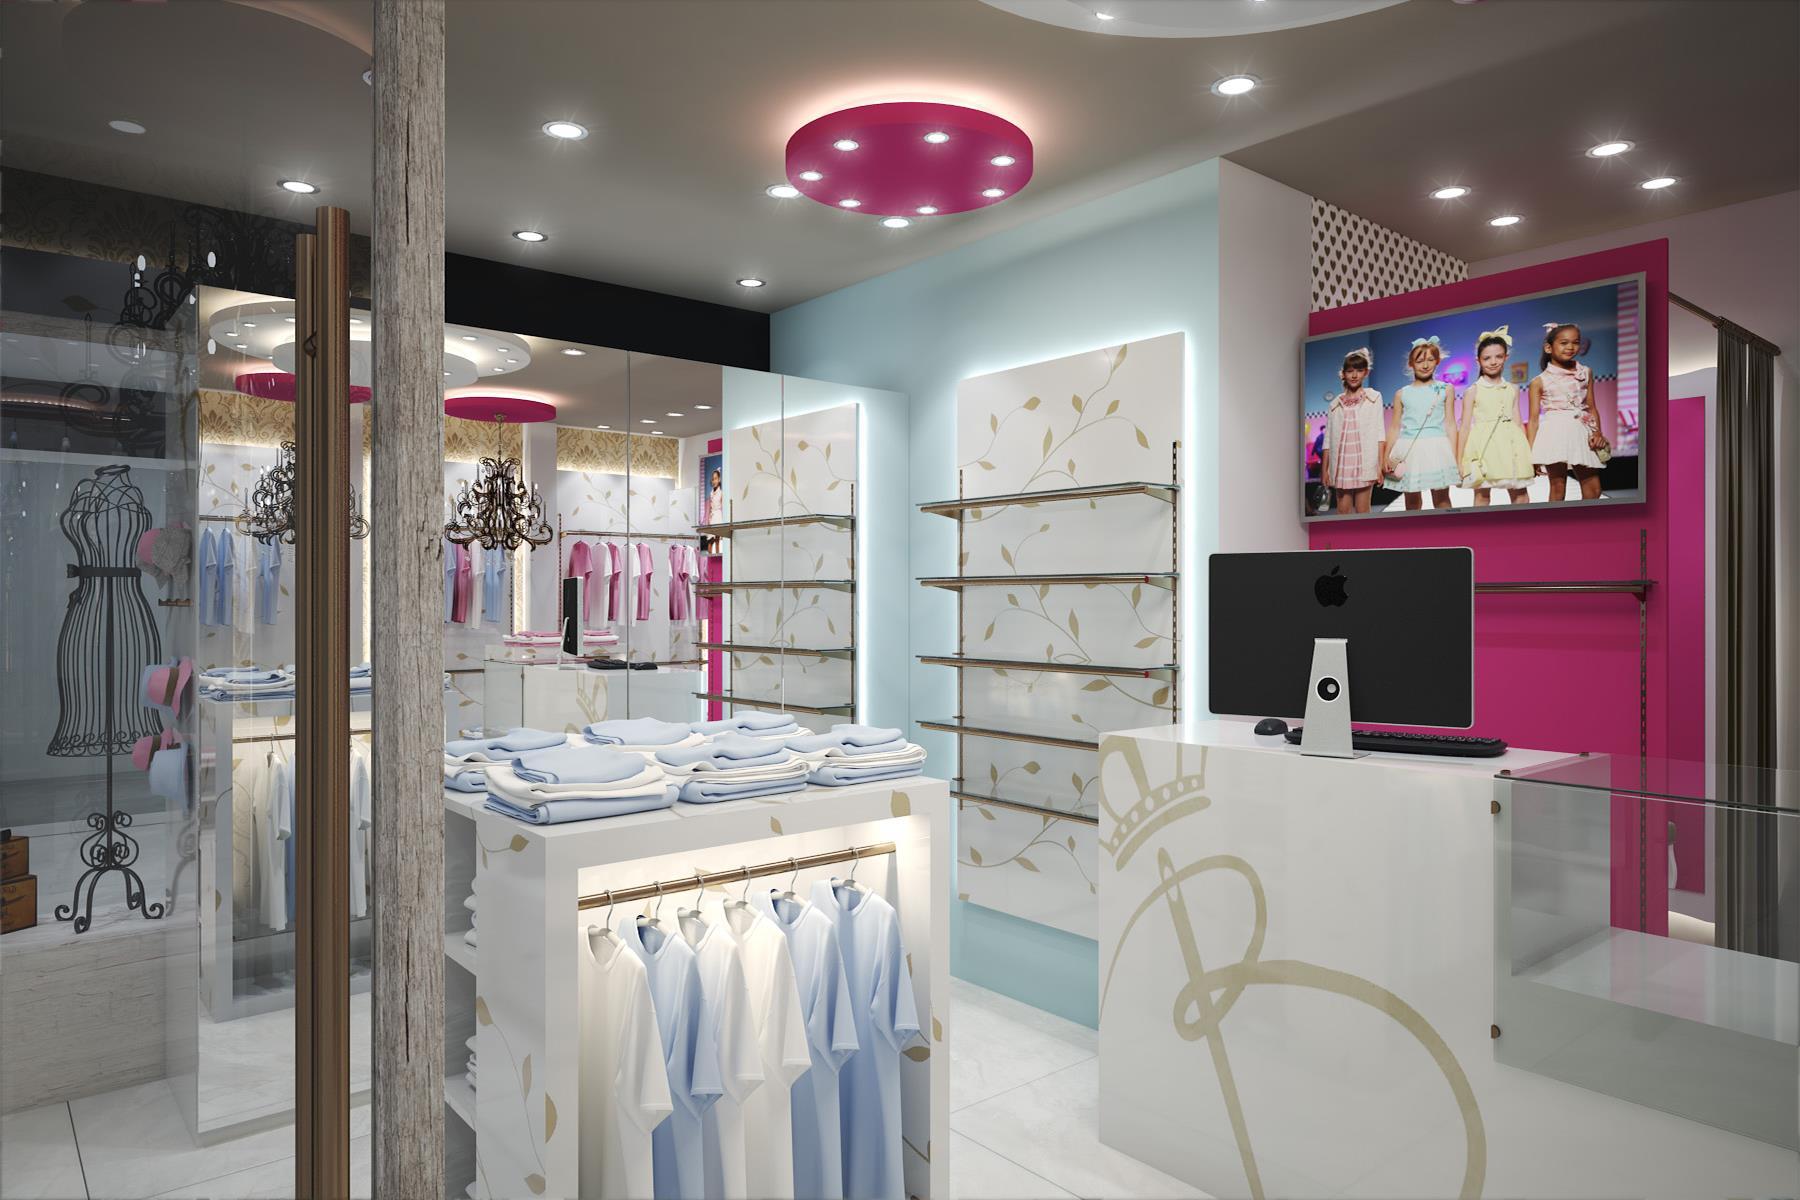 Brand butik La Duquesa